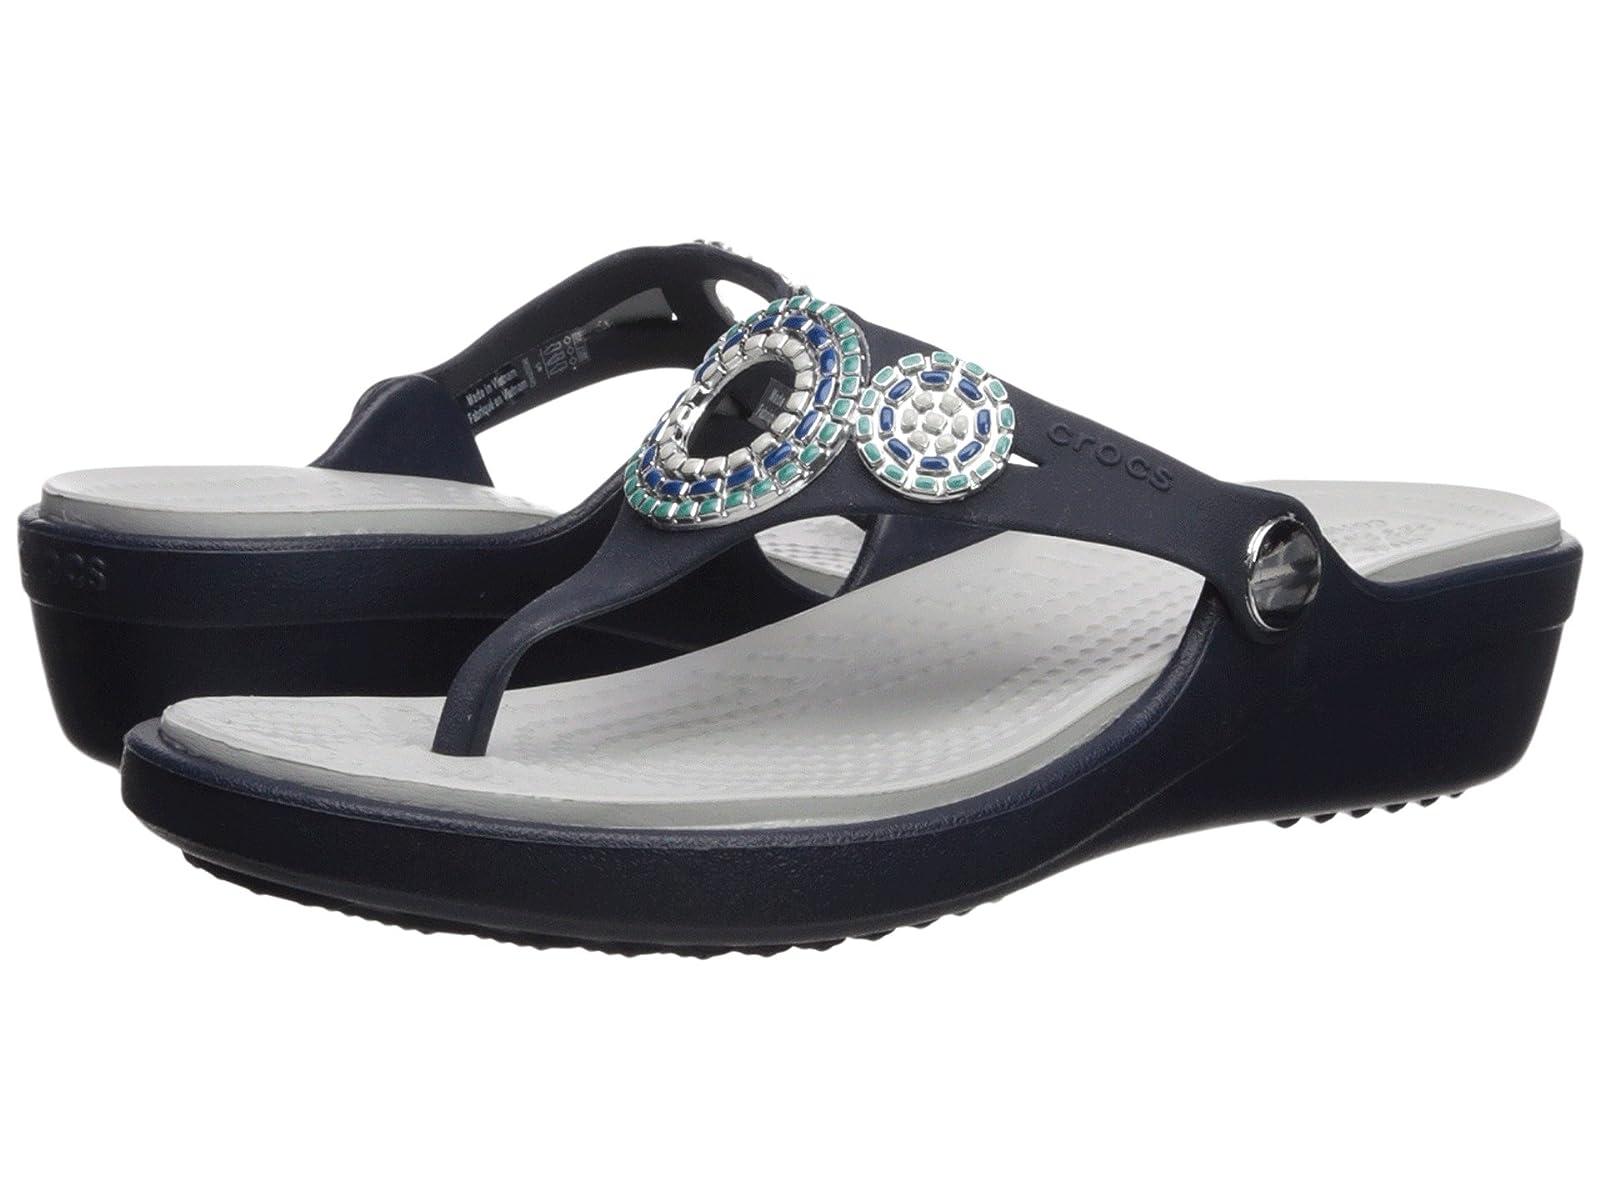 Crocs Sanrah Diamante Wedge FlipComfortable and distinctive shoes